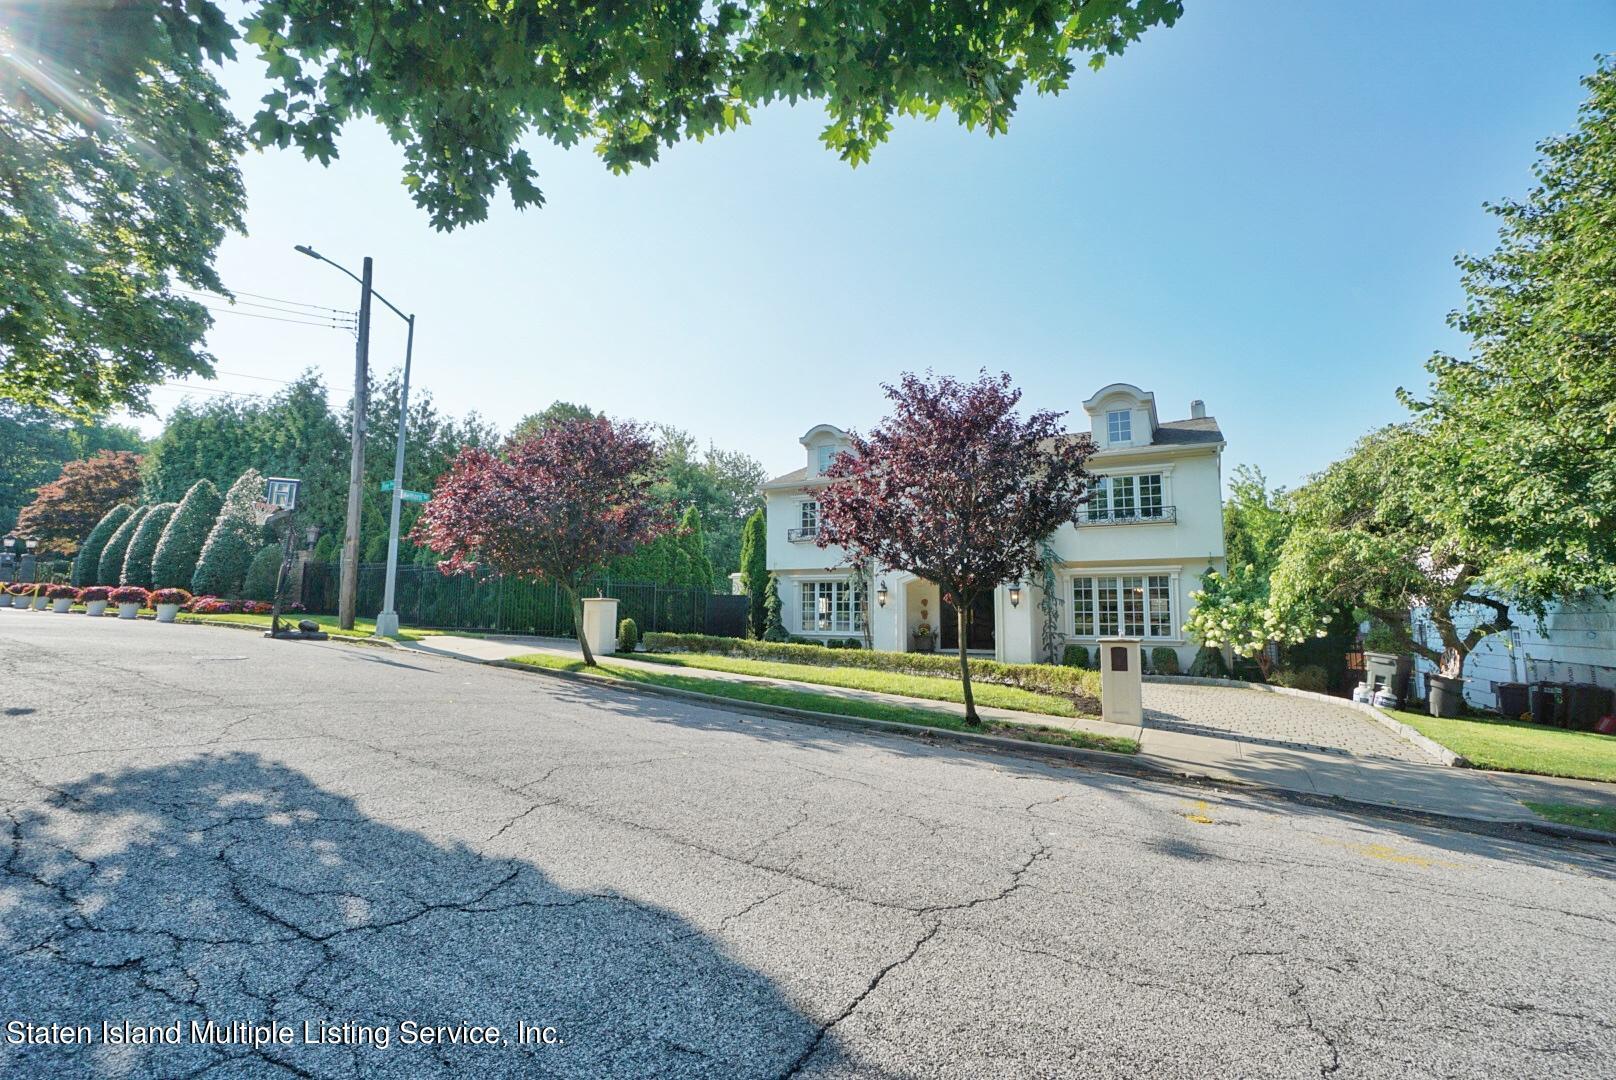 Single Family - Detached 116 Fine Blvd   Staten Island, NY 10314, MLS-1148291-42